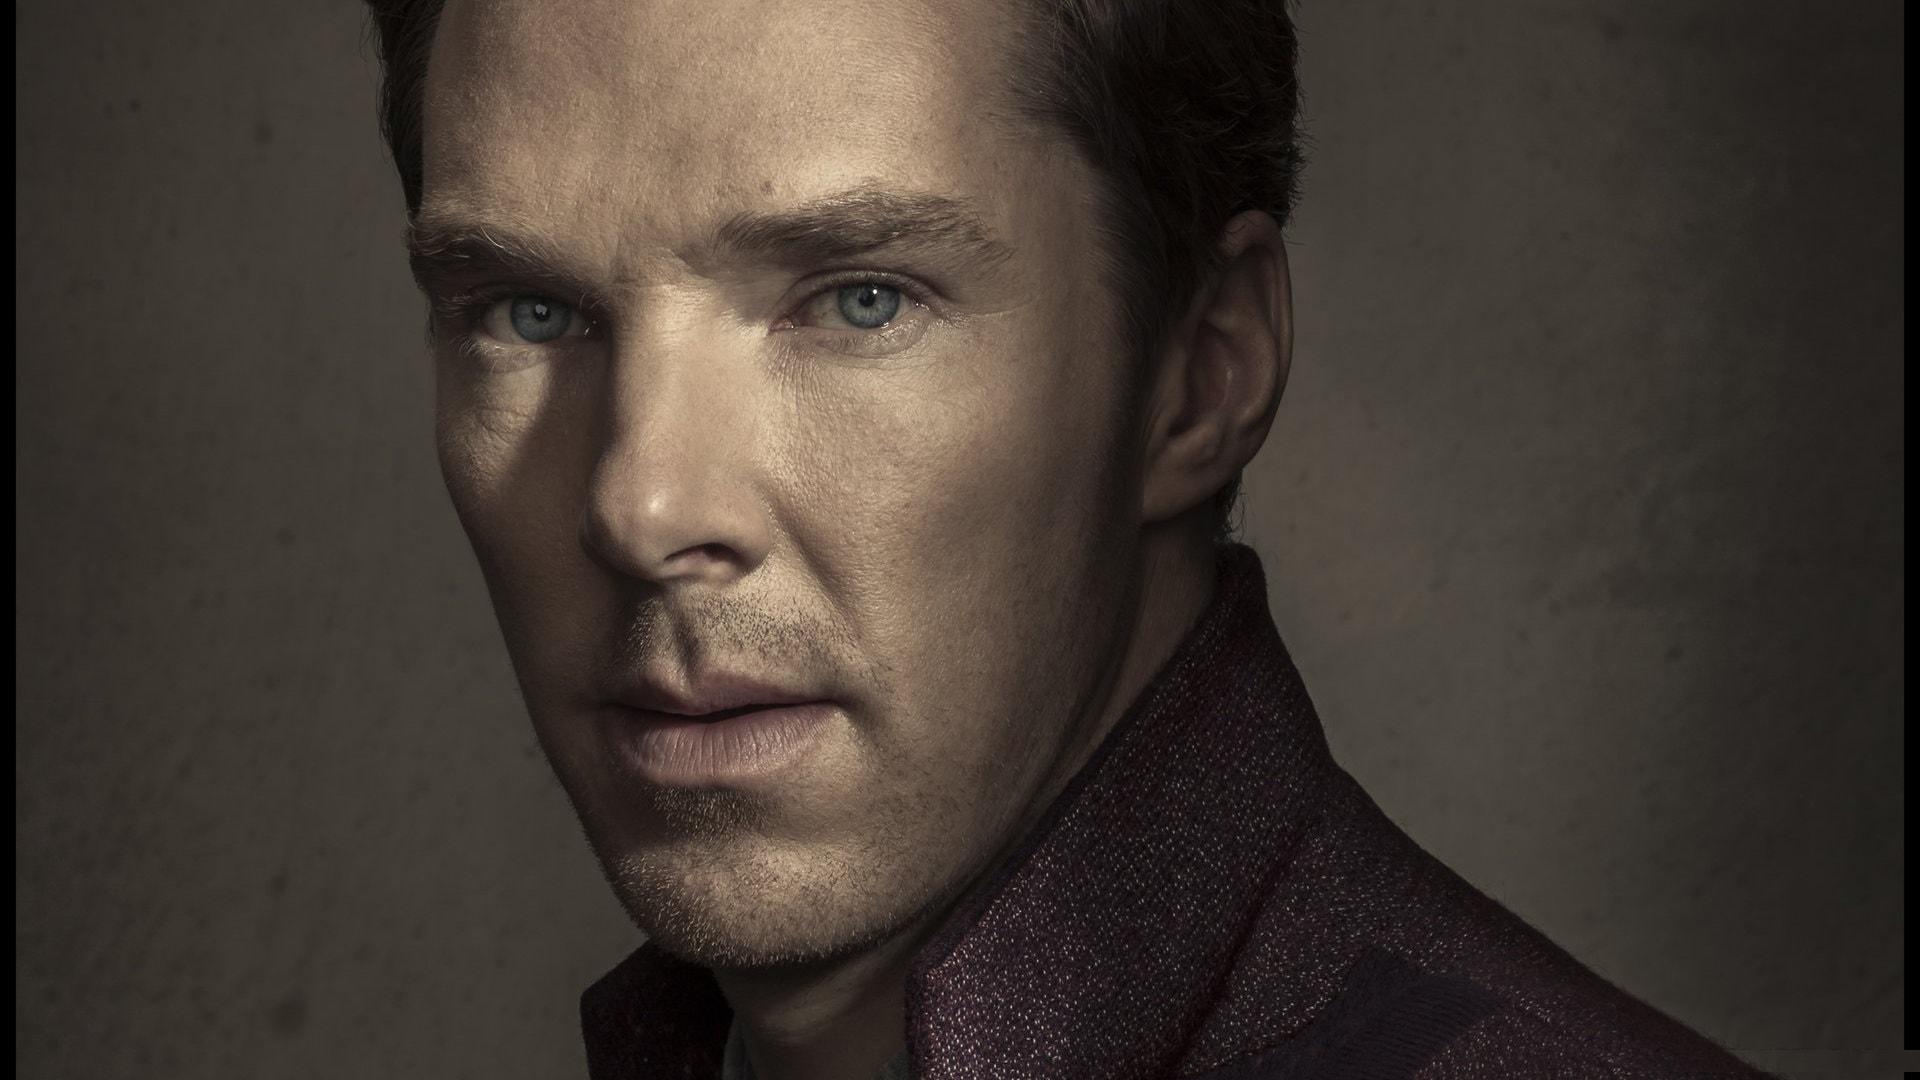 Benedict Cumberbatch Wide wallpapers